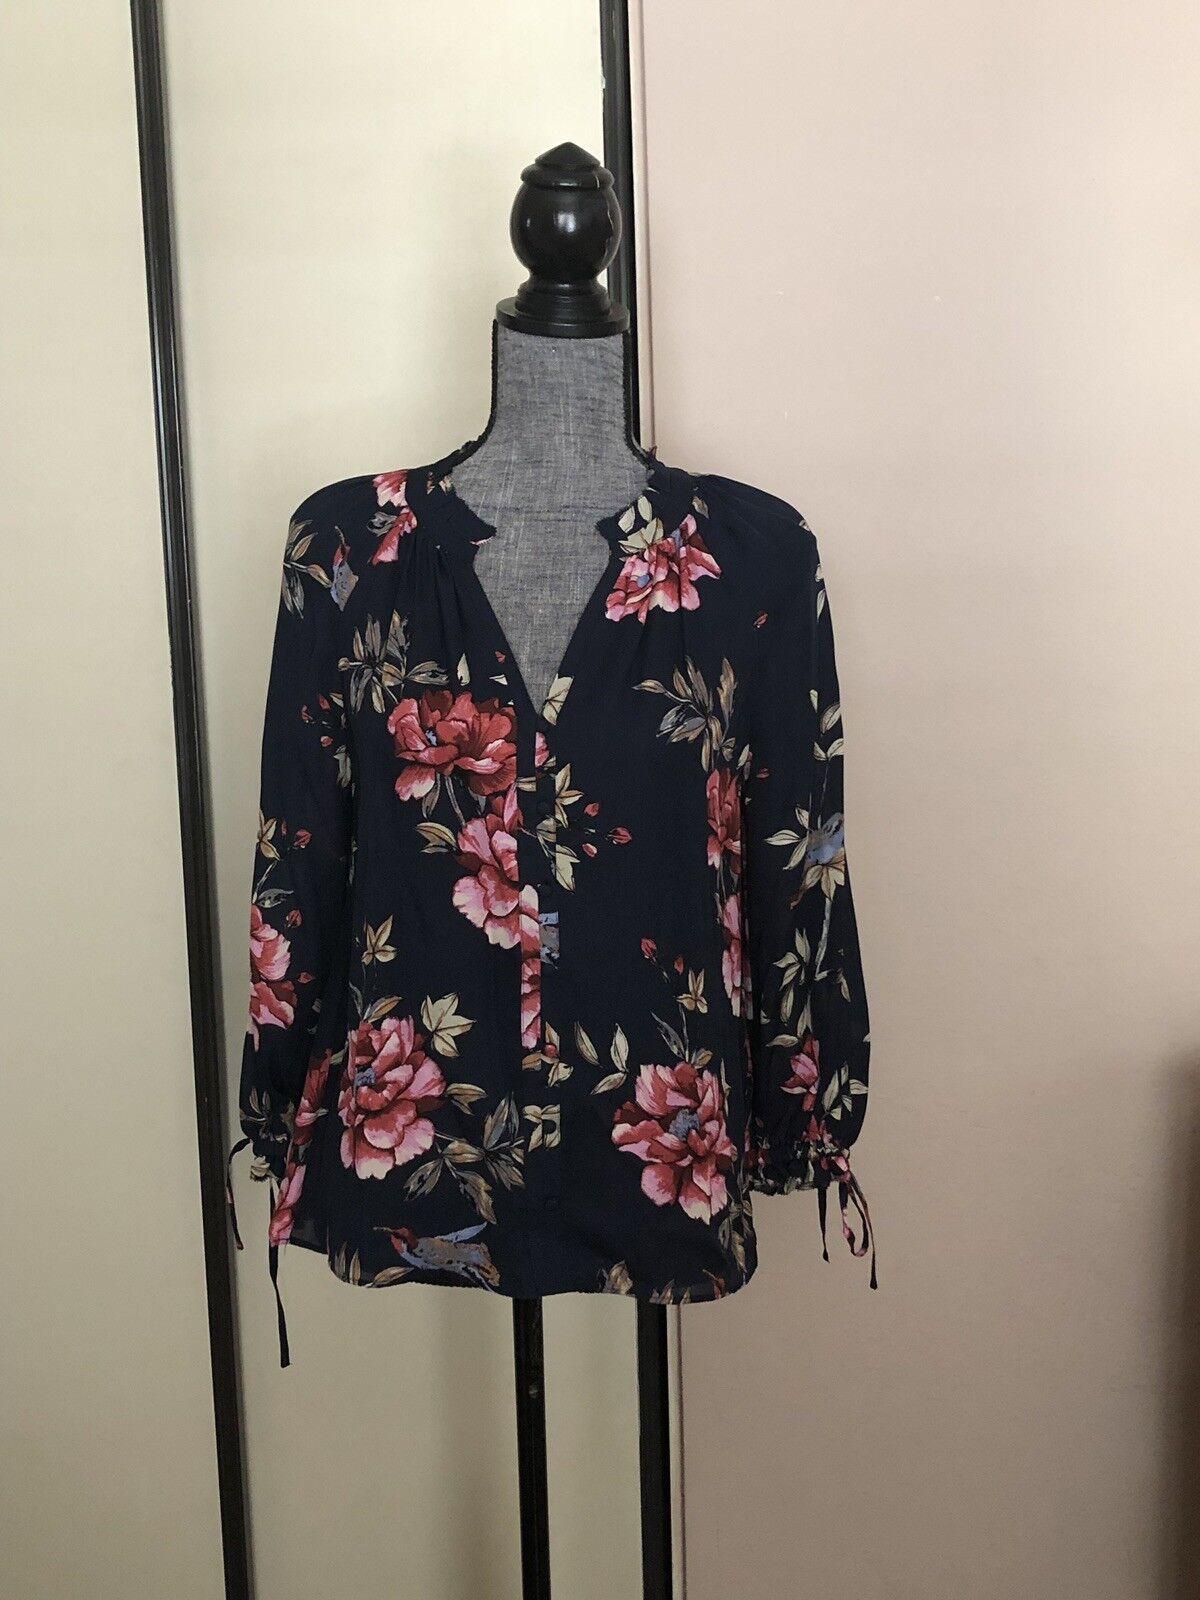 Joie 100% Silk V Neck Floral Printed Long Sleeves Silk Top Größe M New